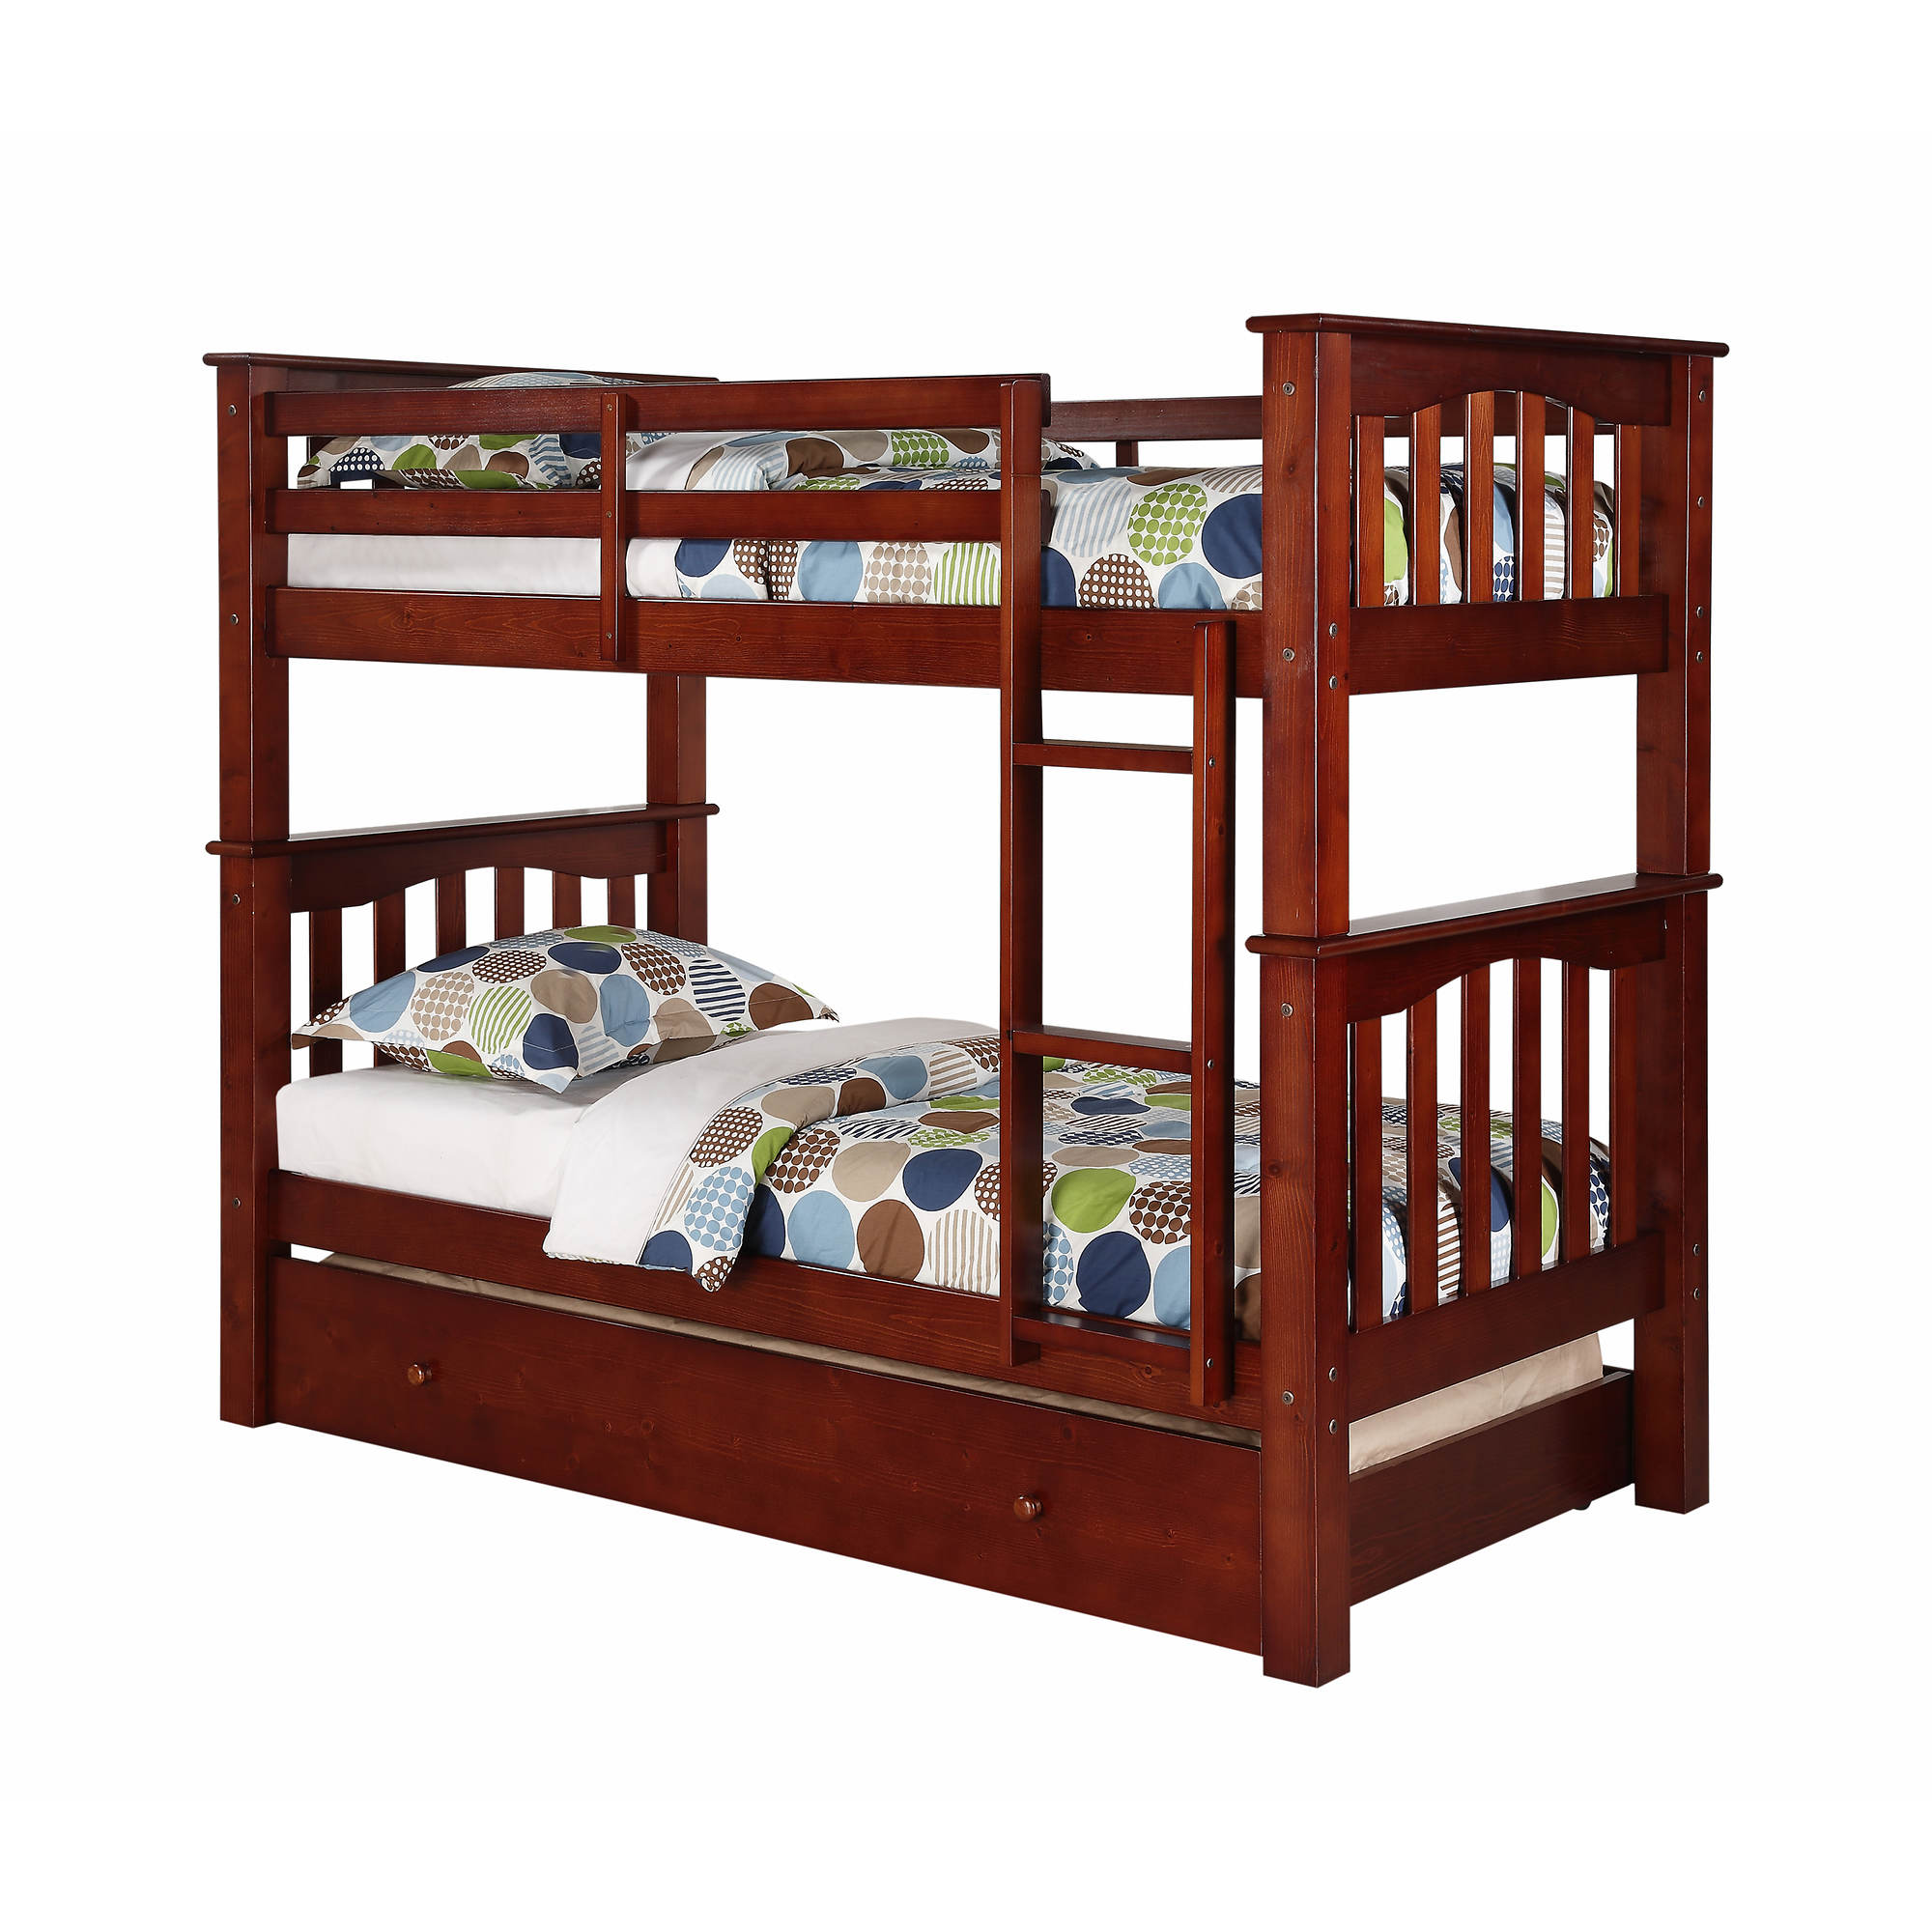 Berkley Jensen Twin Size Bunk Bed With Trundle Bj S